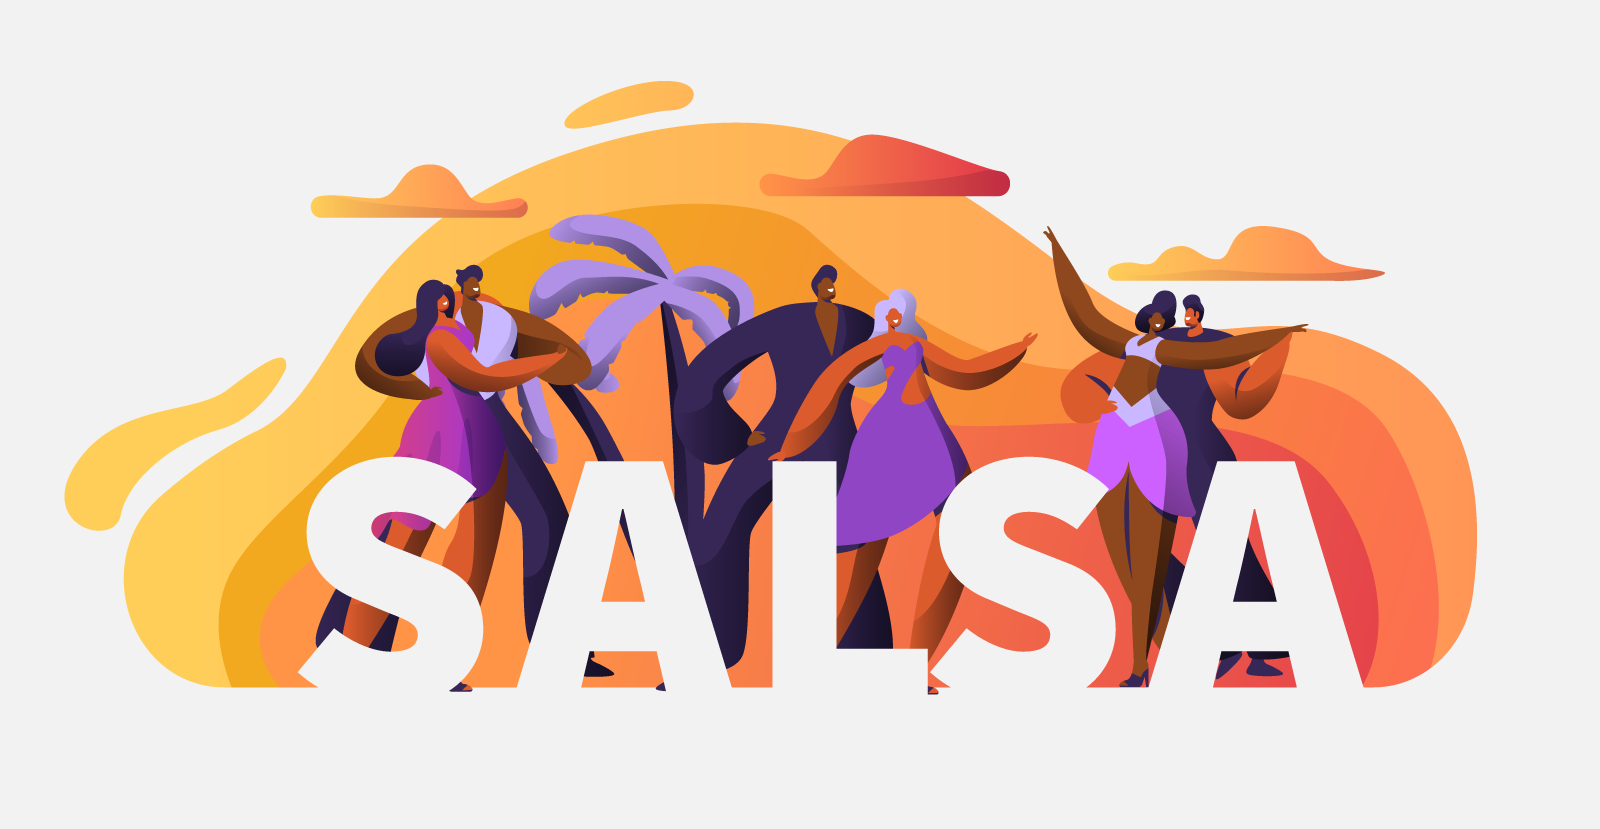 Playlist Salsa